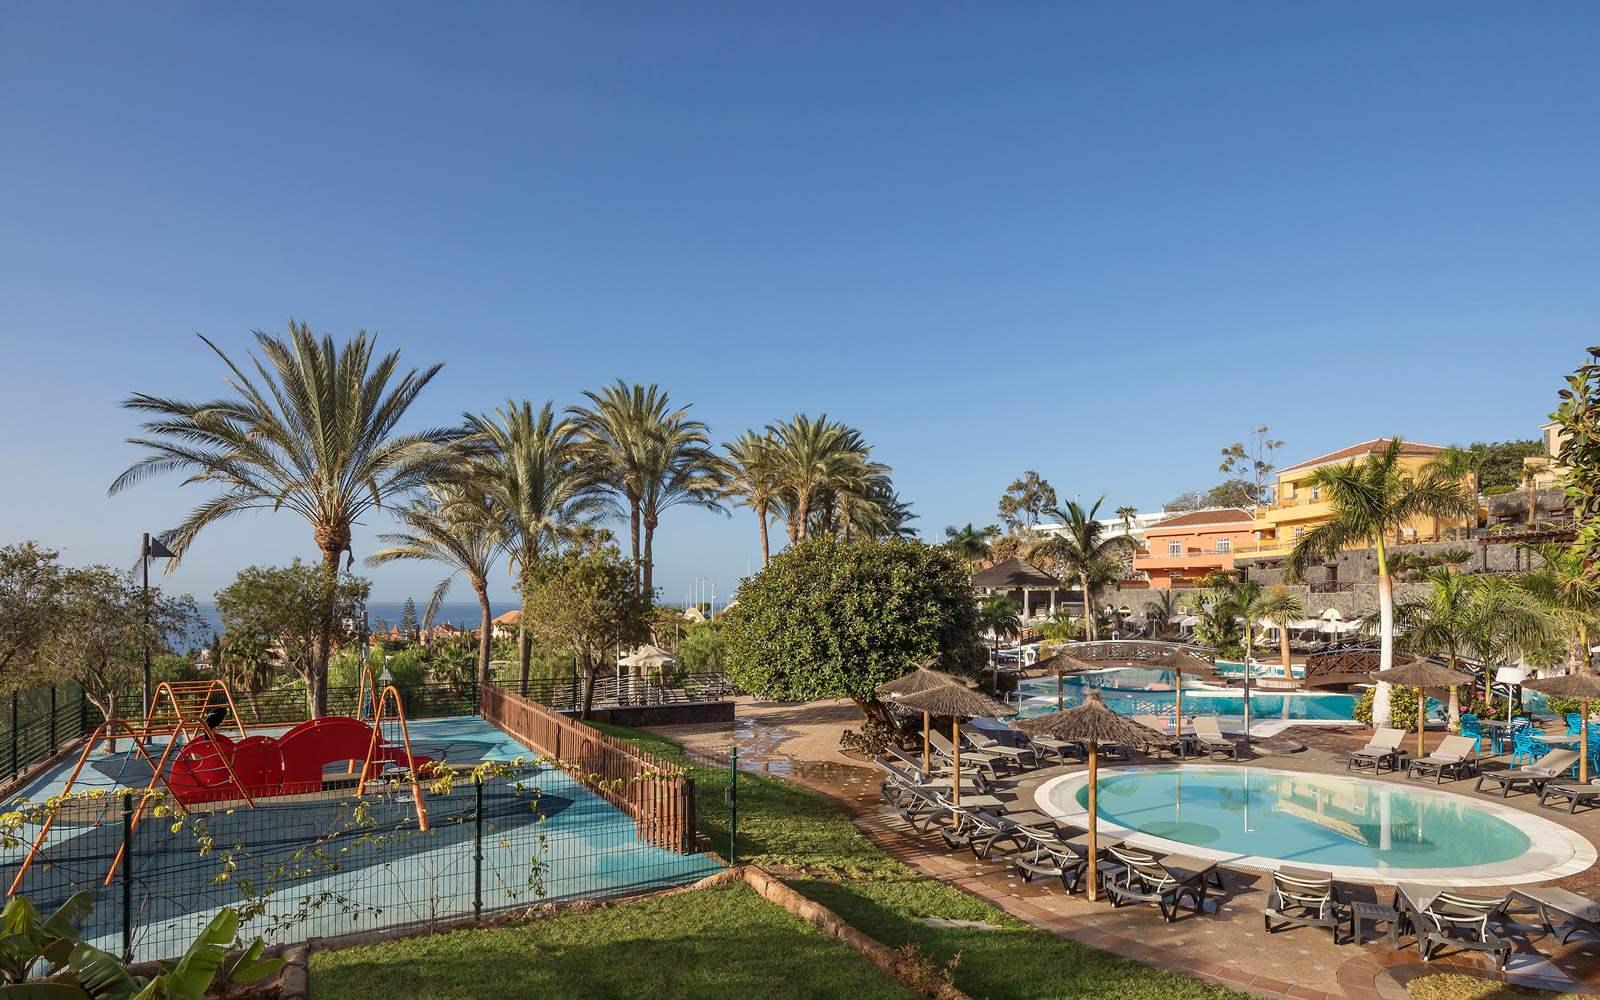 Melia Jardines del Teide - Children's playground & pool